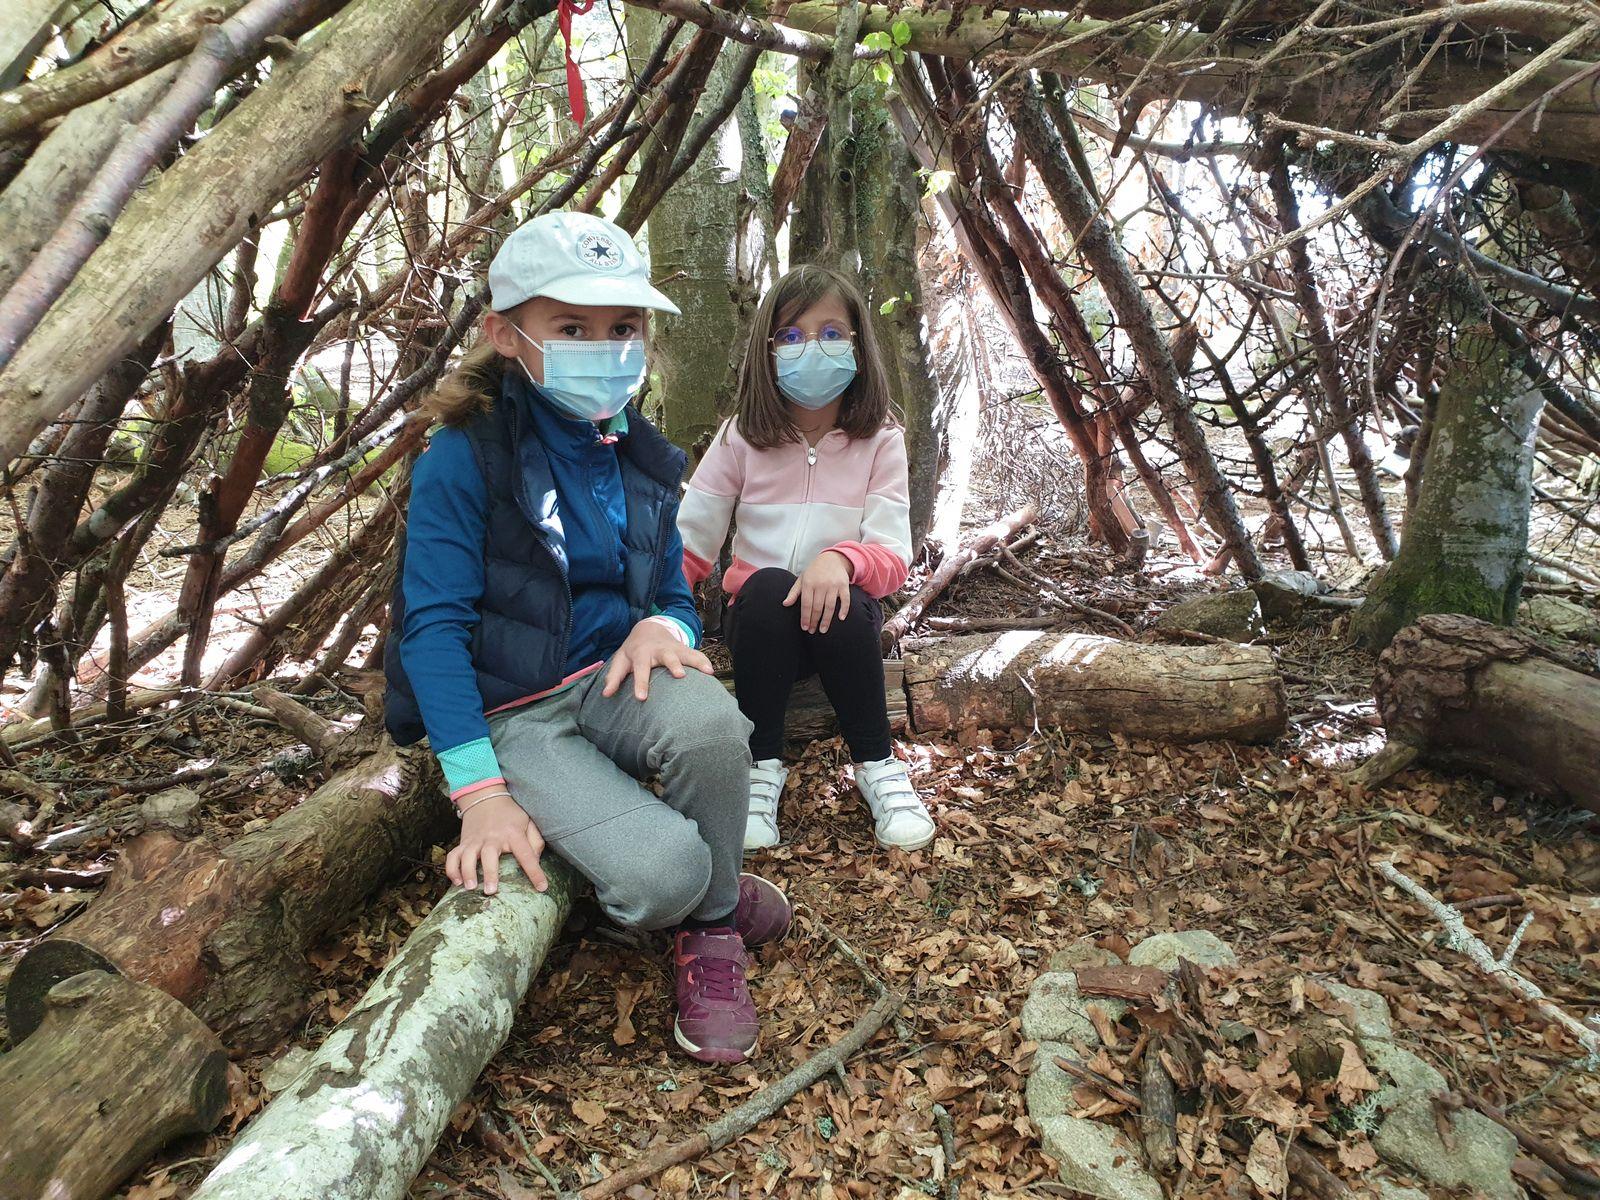 Sortie nature au Bessat le vendredi 28 mai 2021